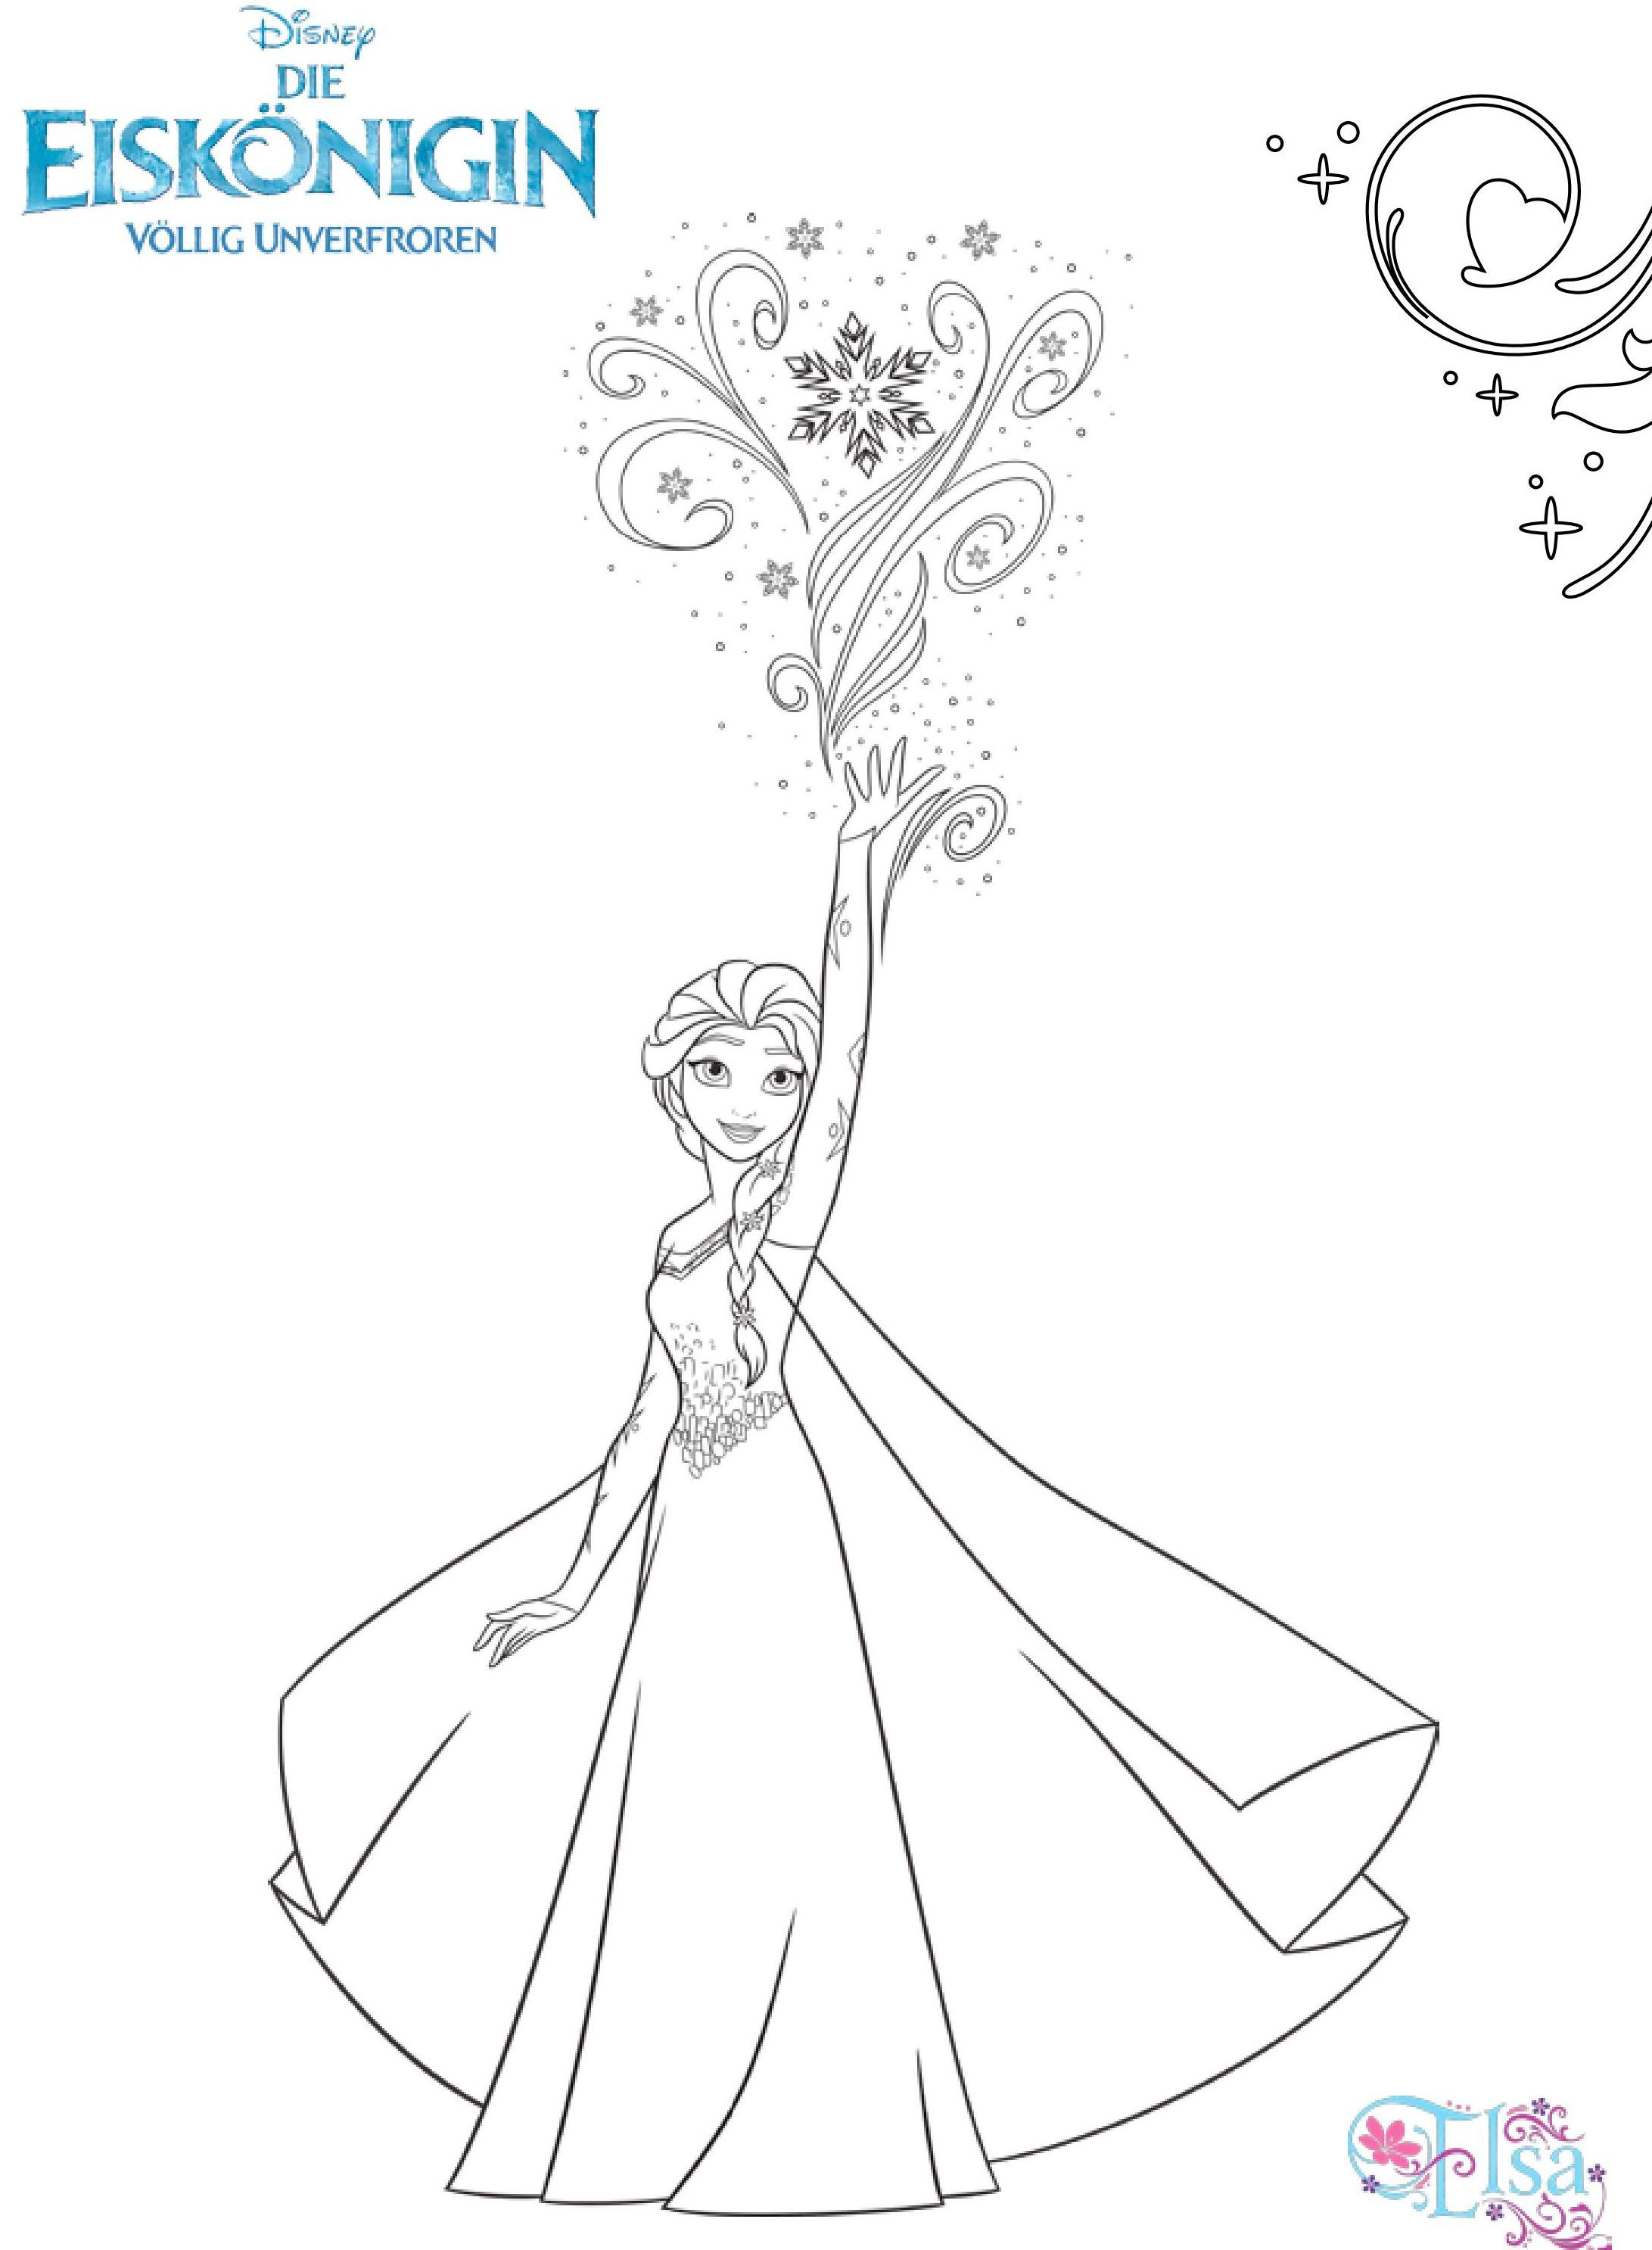 Ausmalbilder Elsas Magische Fahigkeiten E1551072491126 Ausmalbilder Ausmalbilder Anna Und Elsa Malvorlagen Zum Ausdrucken